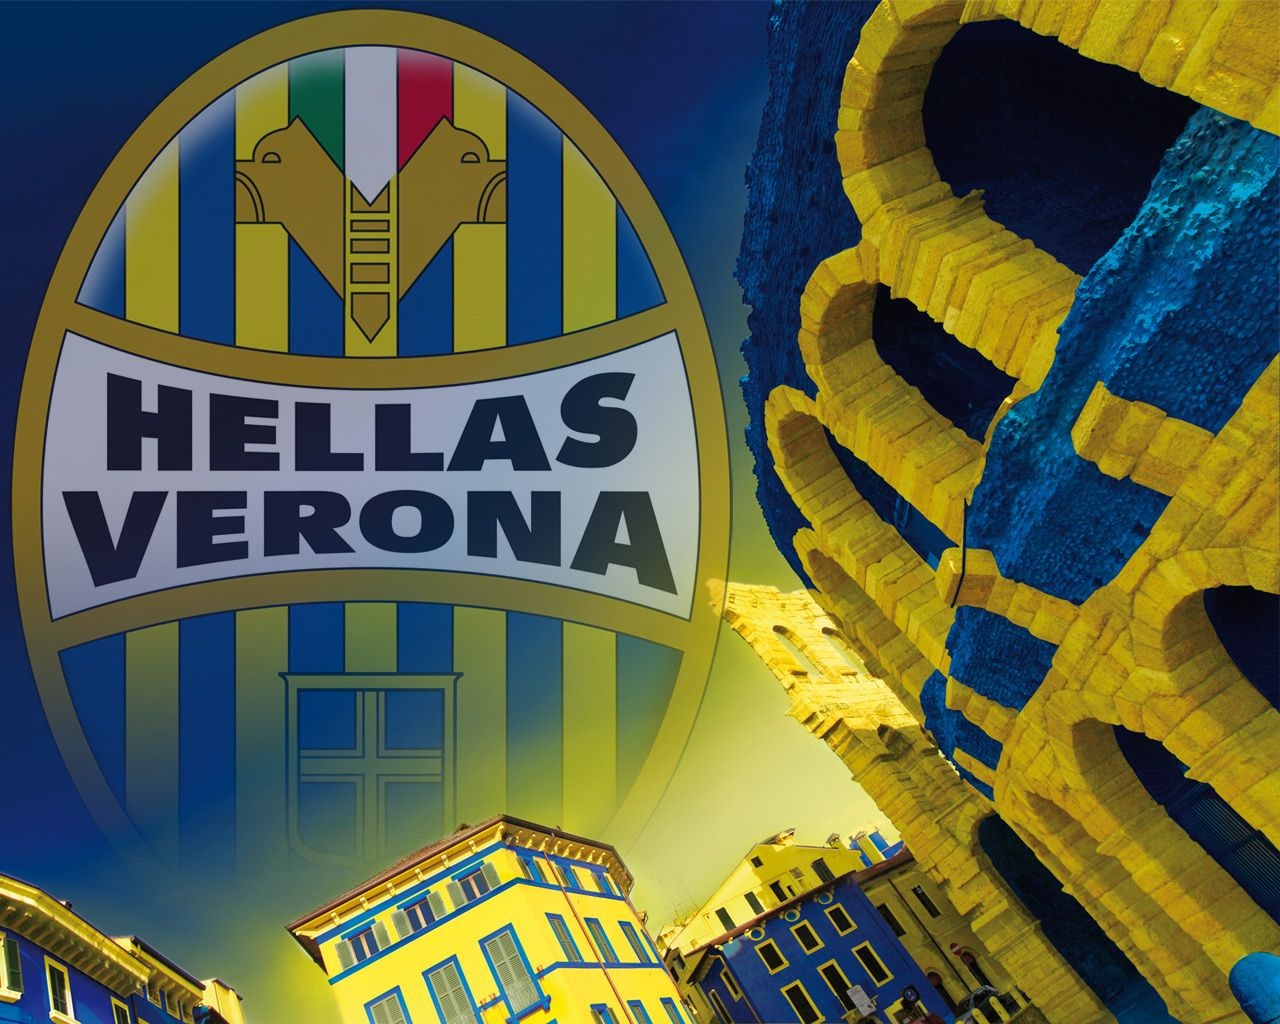 Hellas Verona Logo   Verona, Community, Football team